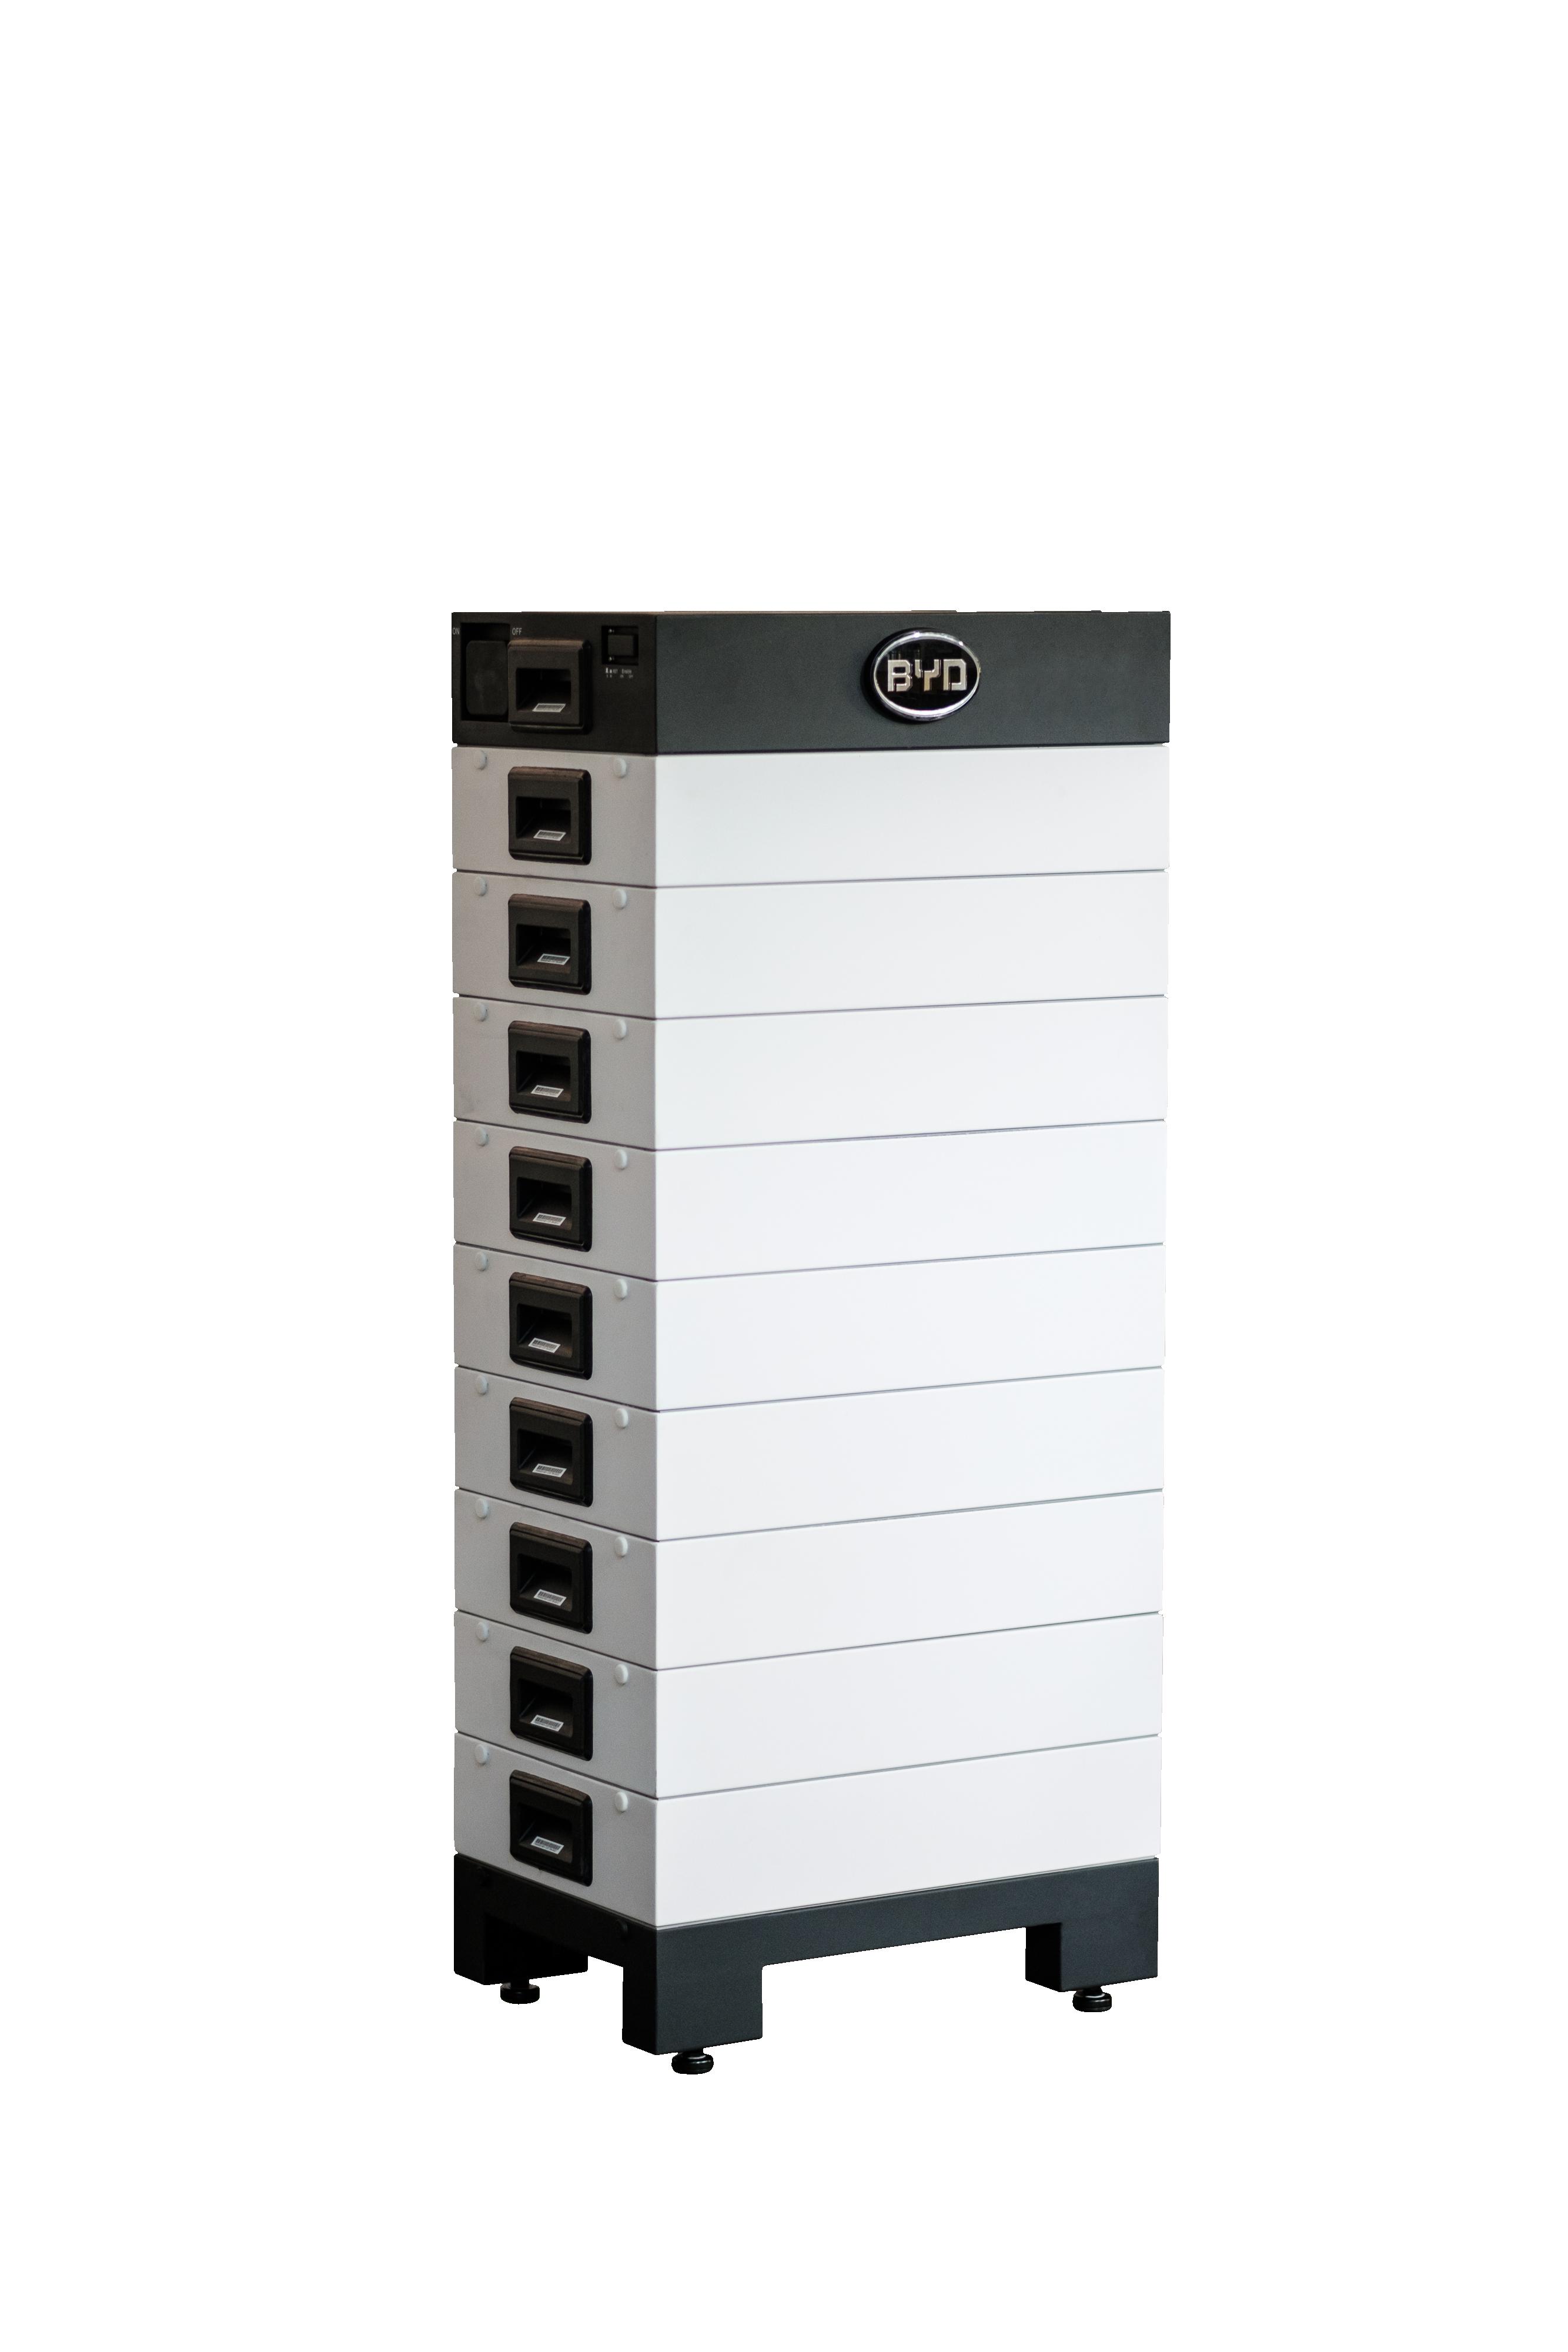 Battery-Box HV (Hochvolt/High Voltage)